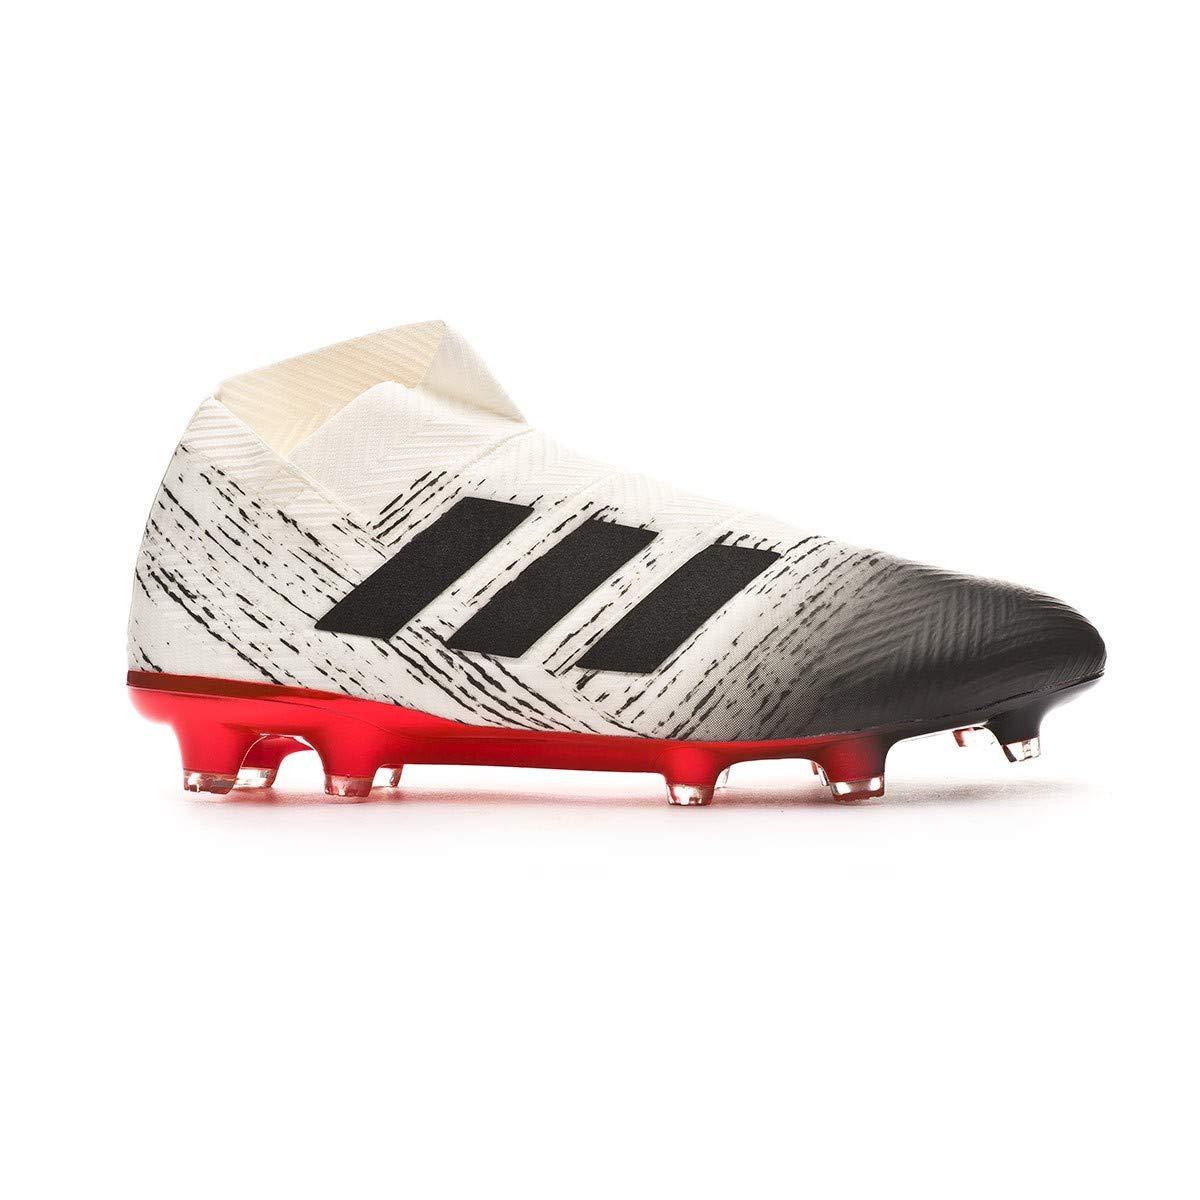 Adidas Performance Nemeziz 18+ FG Fußballschuh Herren